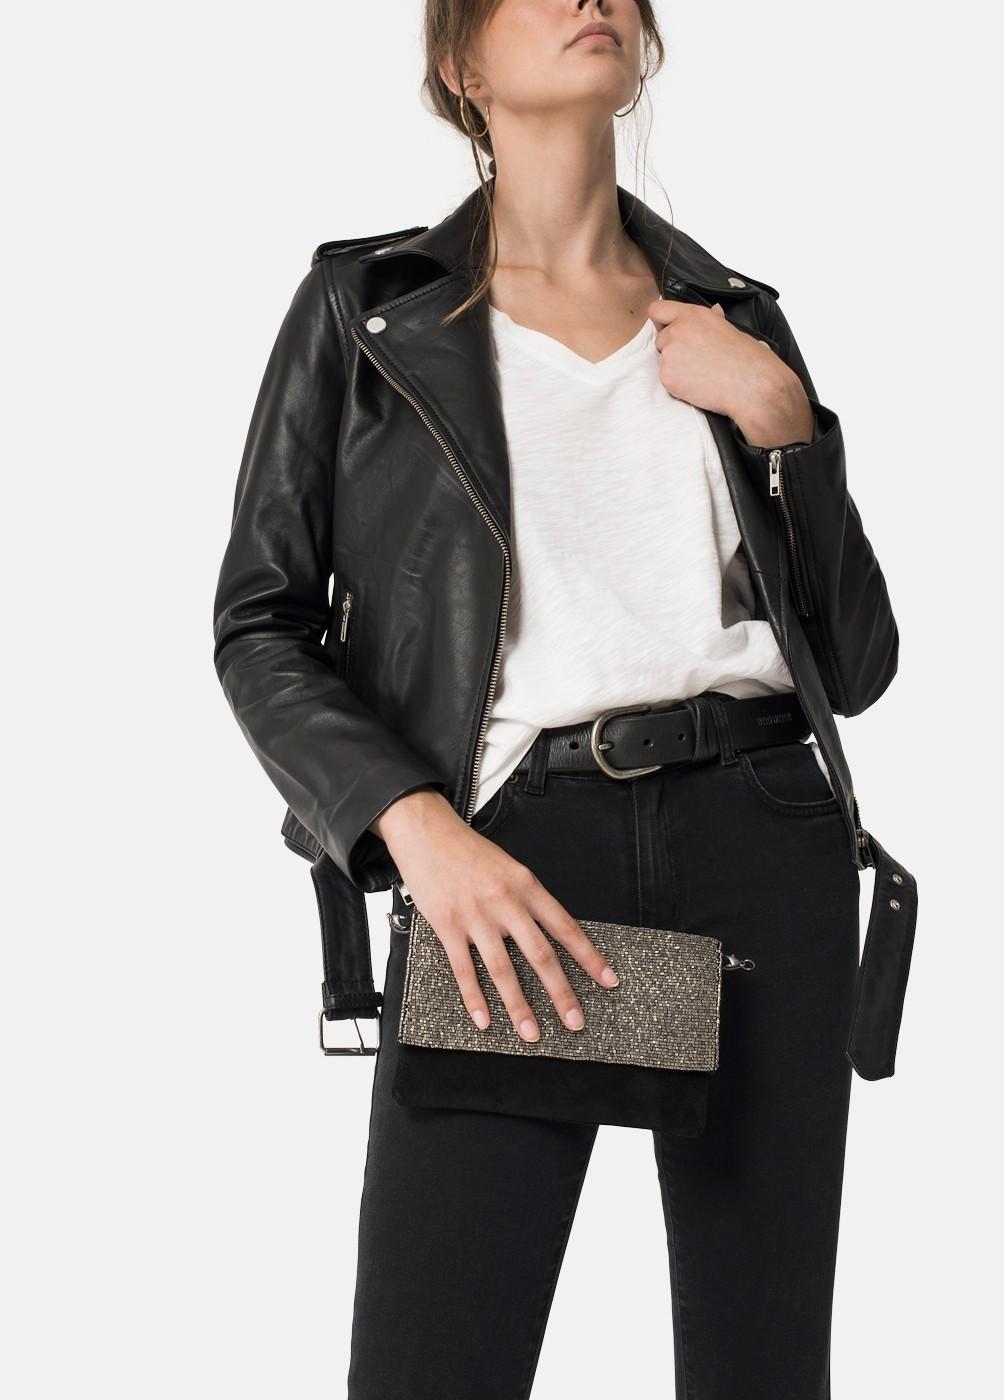 ELOISA CLUTCH BAG